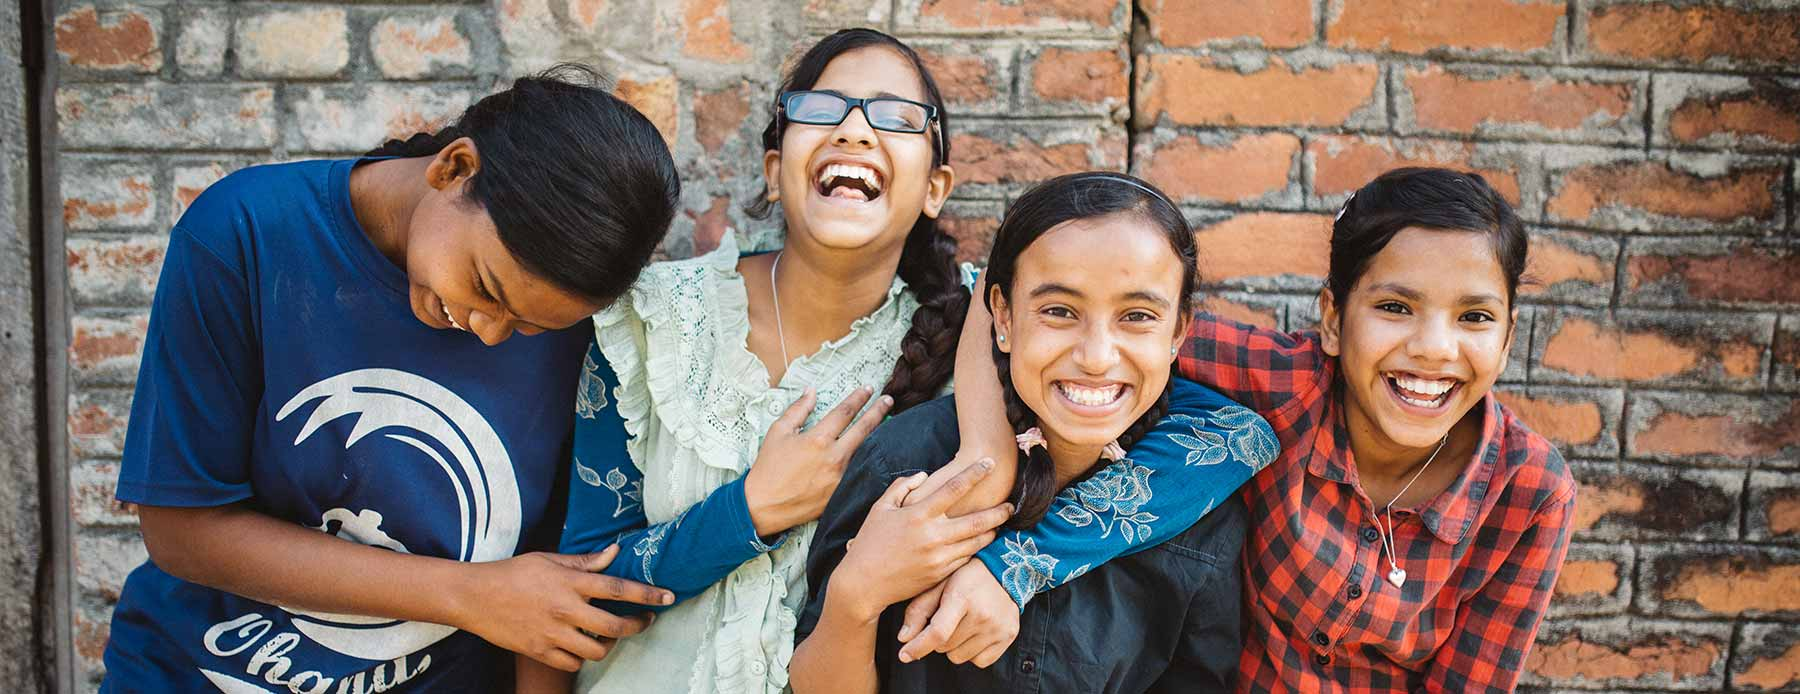 gsam-girls-laughing